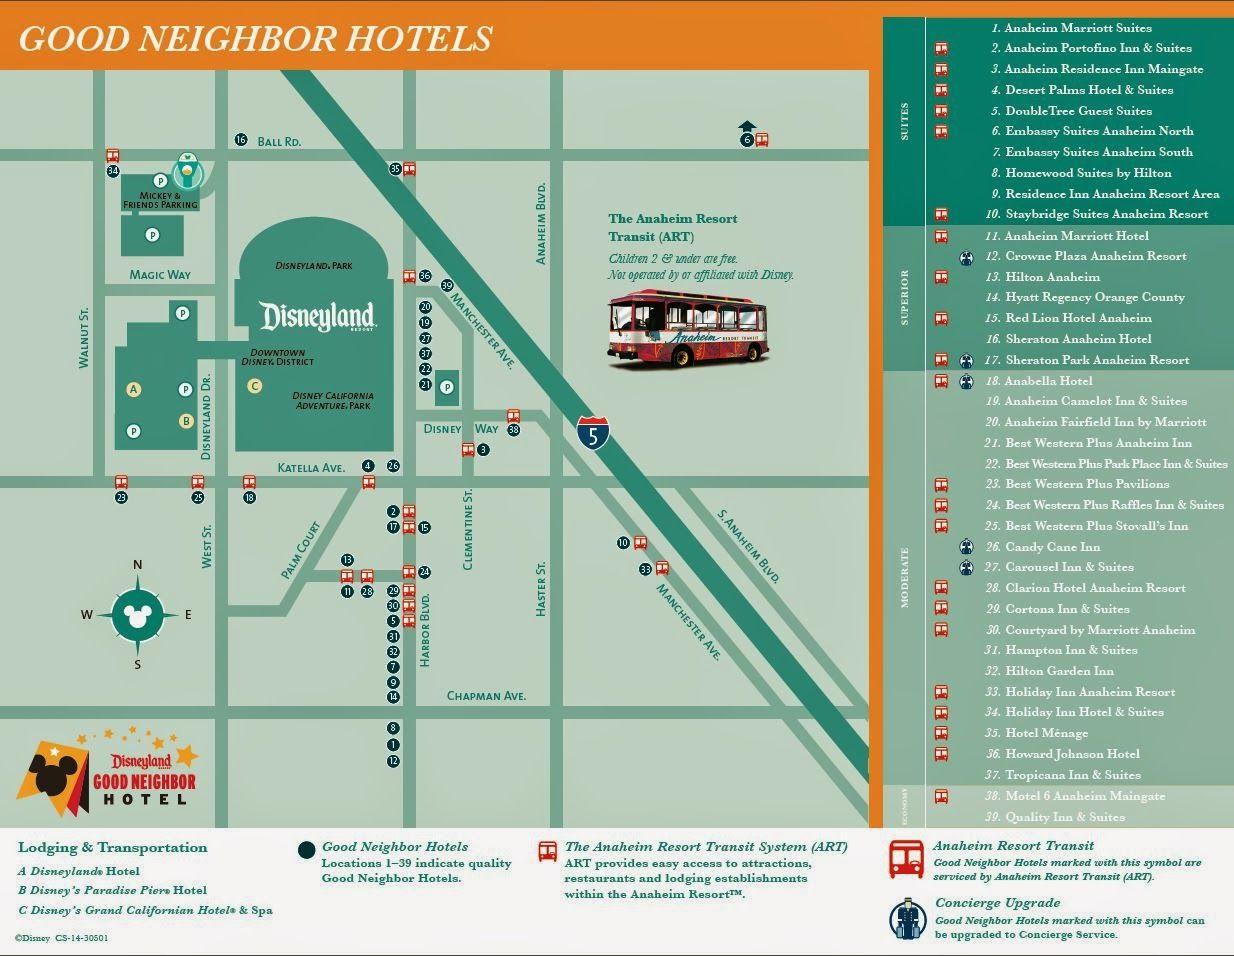 Disneyland Good Neighbor Hotel Map | Disney | Pinterest | Disneyland - Map Of Hotels Around Disneyland California